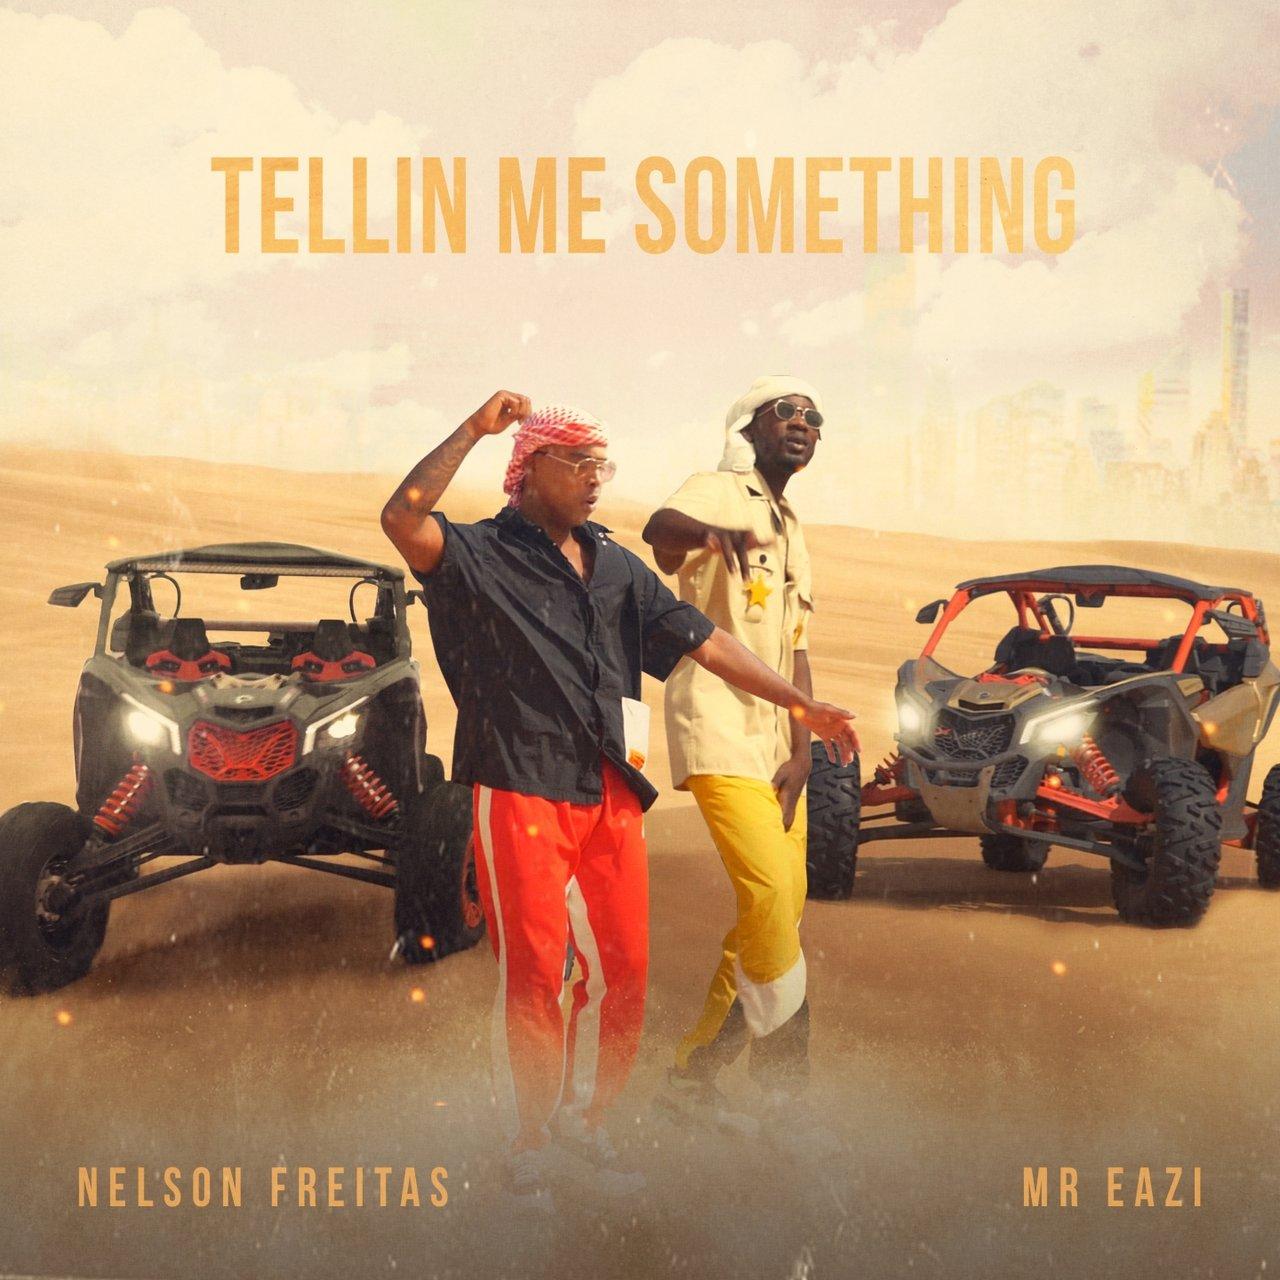 Nelson Freitas - Tellin Me Something (ft. Mr Eazi) (Cover)